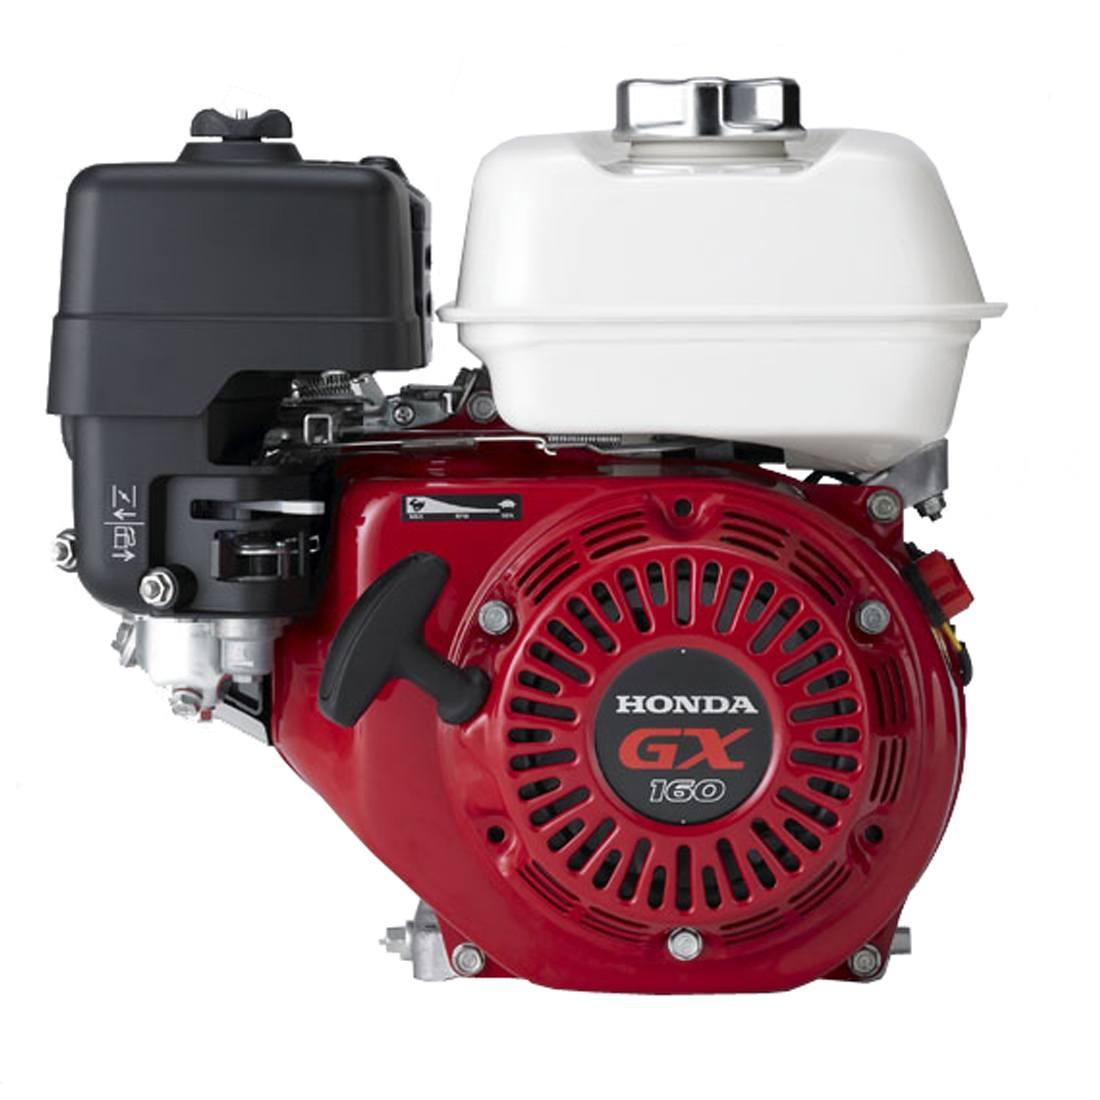 GX160UT2-QX4. Двигатель бензиновый Honda GX 160 QX4